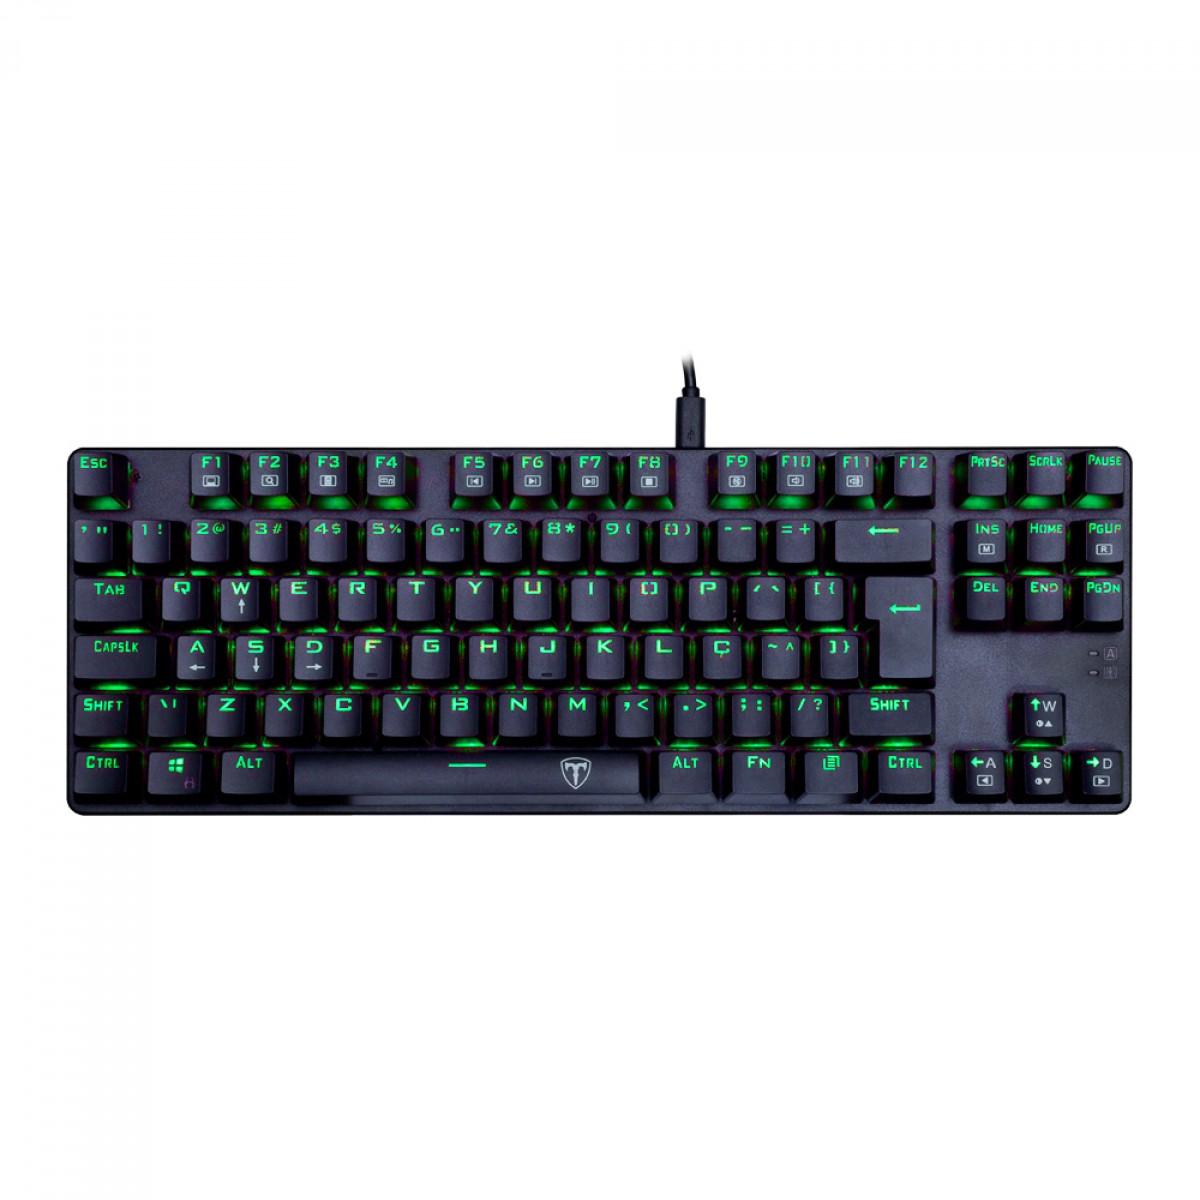 Teclado Gamer Mecânico T-Dagger Bora Single, Switch Blue, ABNT2, Led Green, T-TGK313-BL